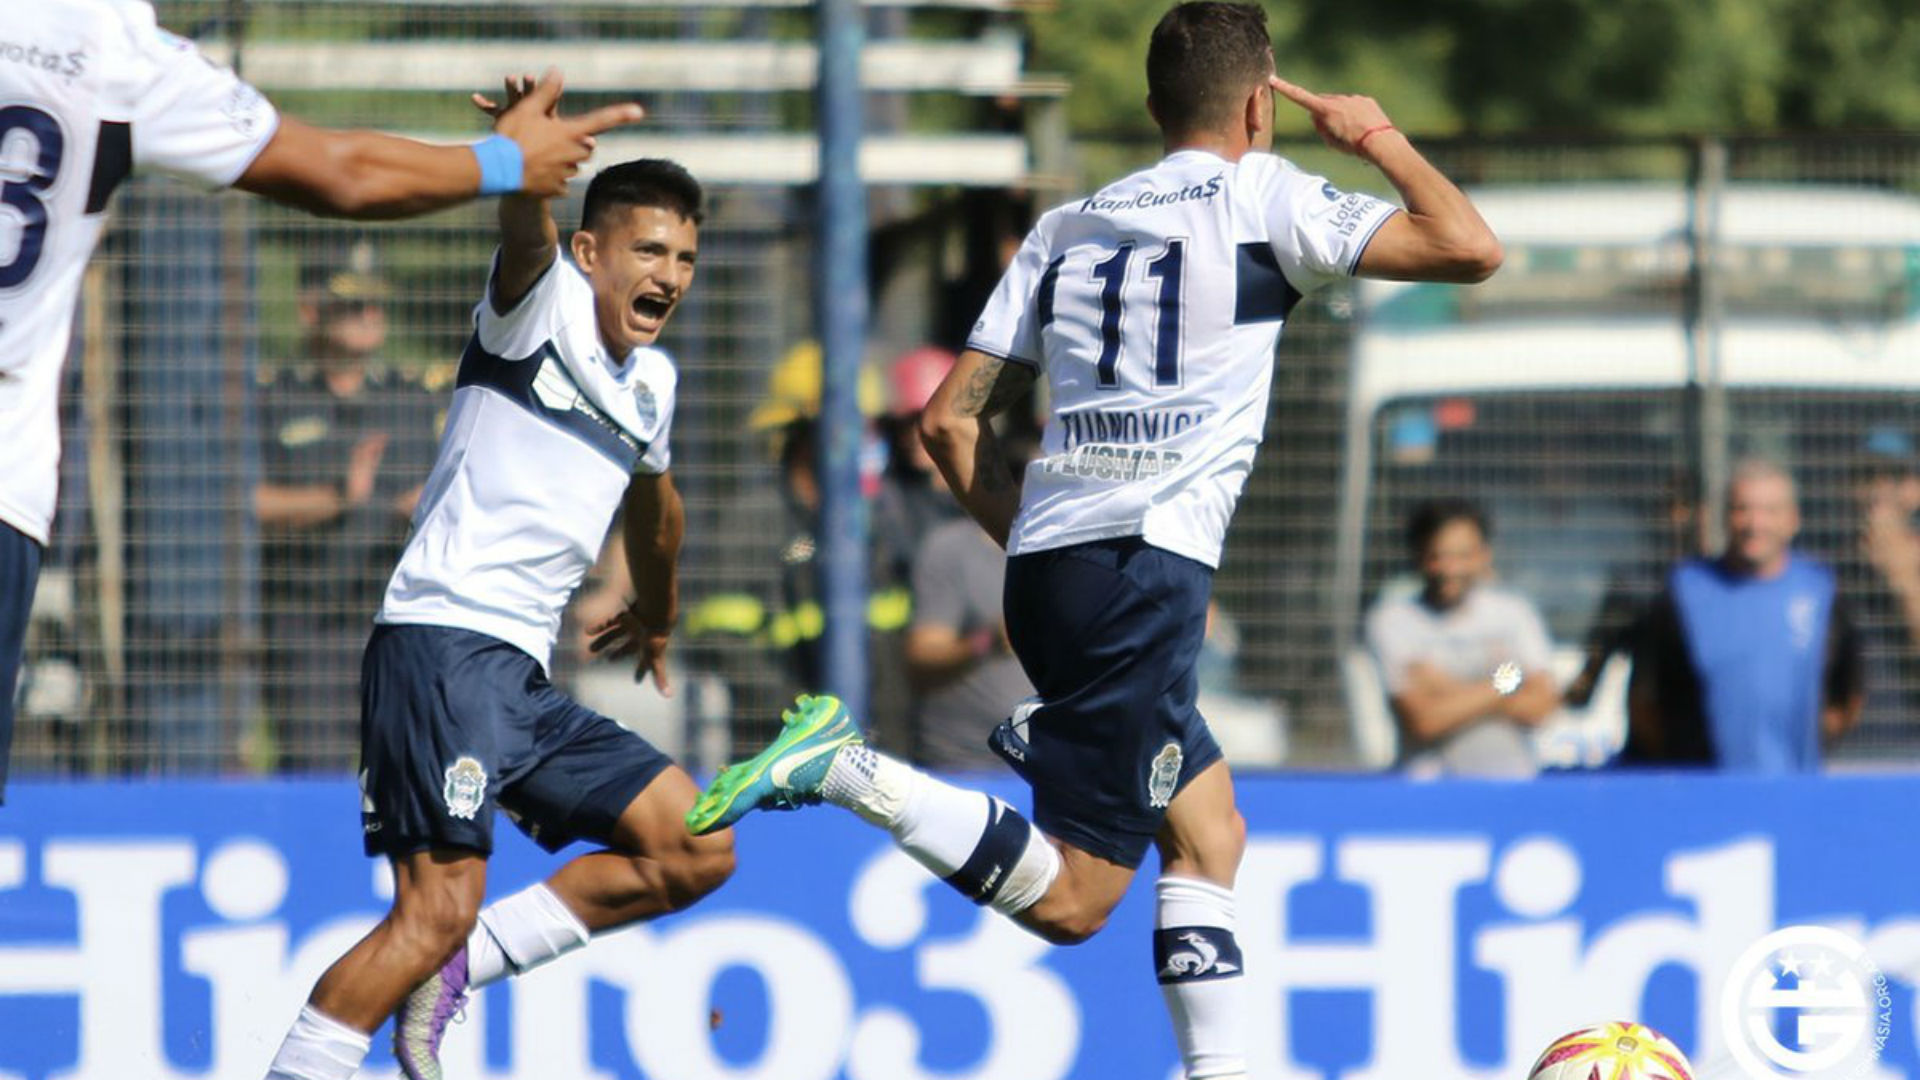 Con gol de Mazzola, Unión le gana a Tigre en Victoria